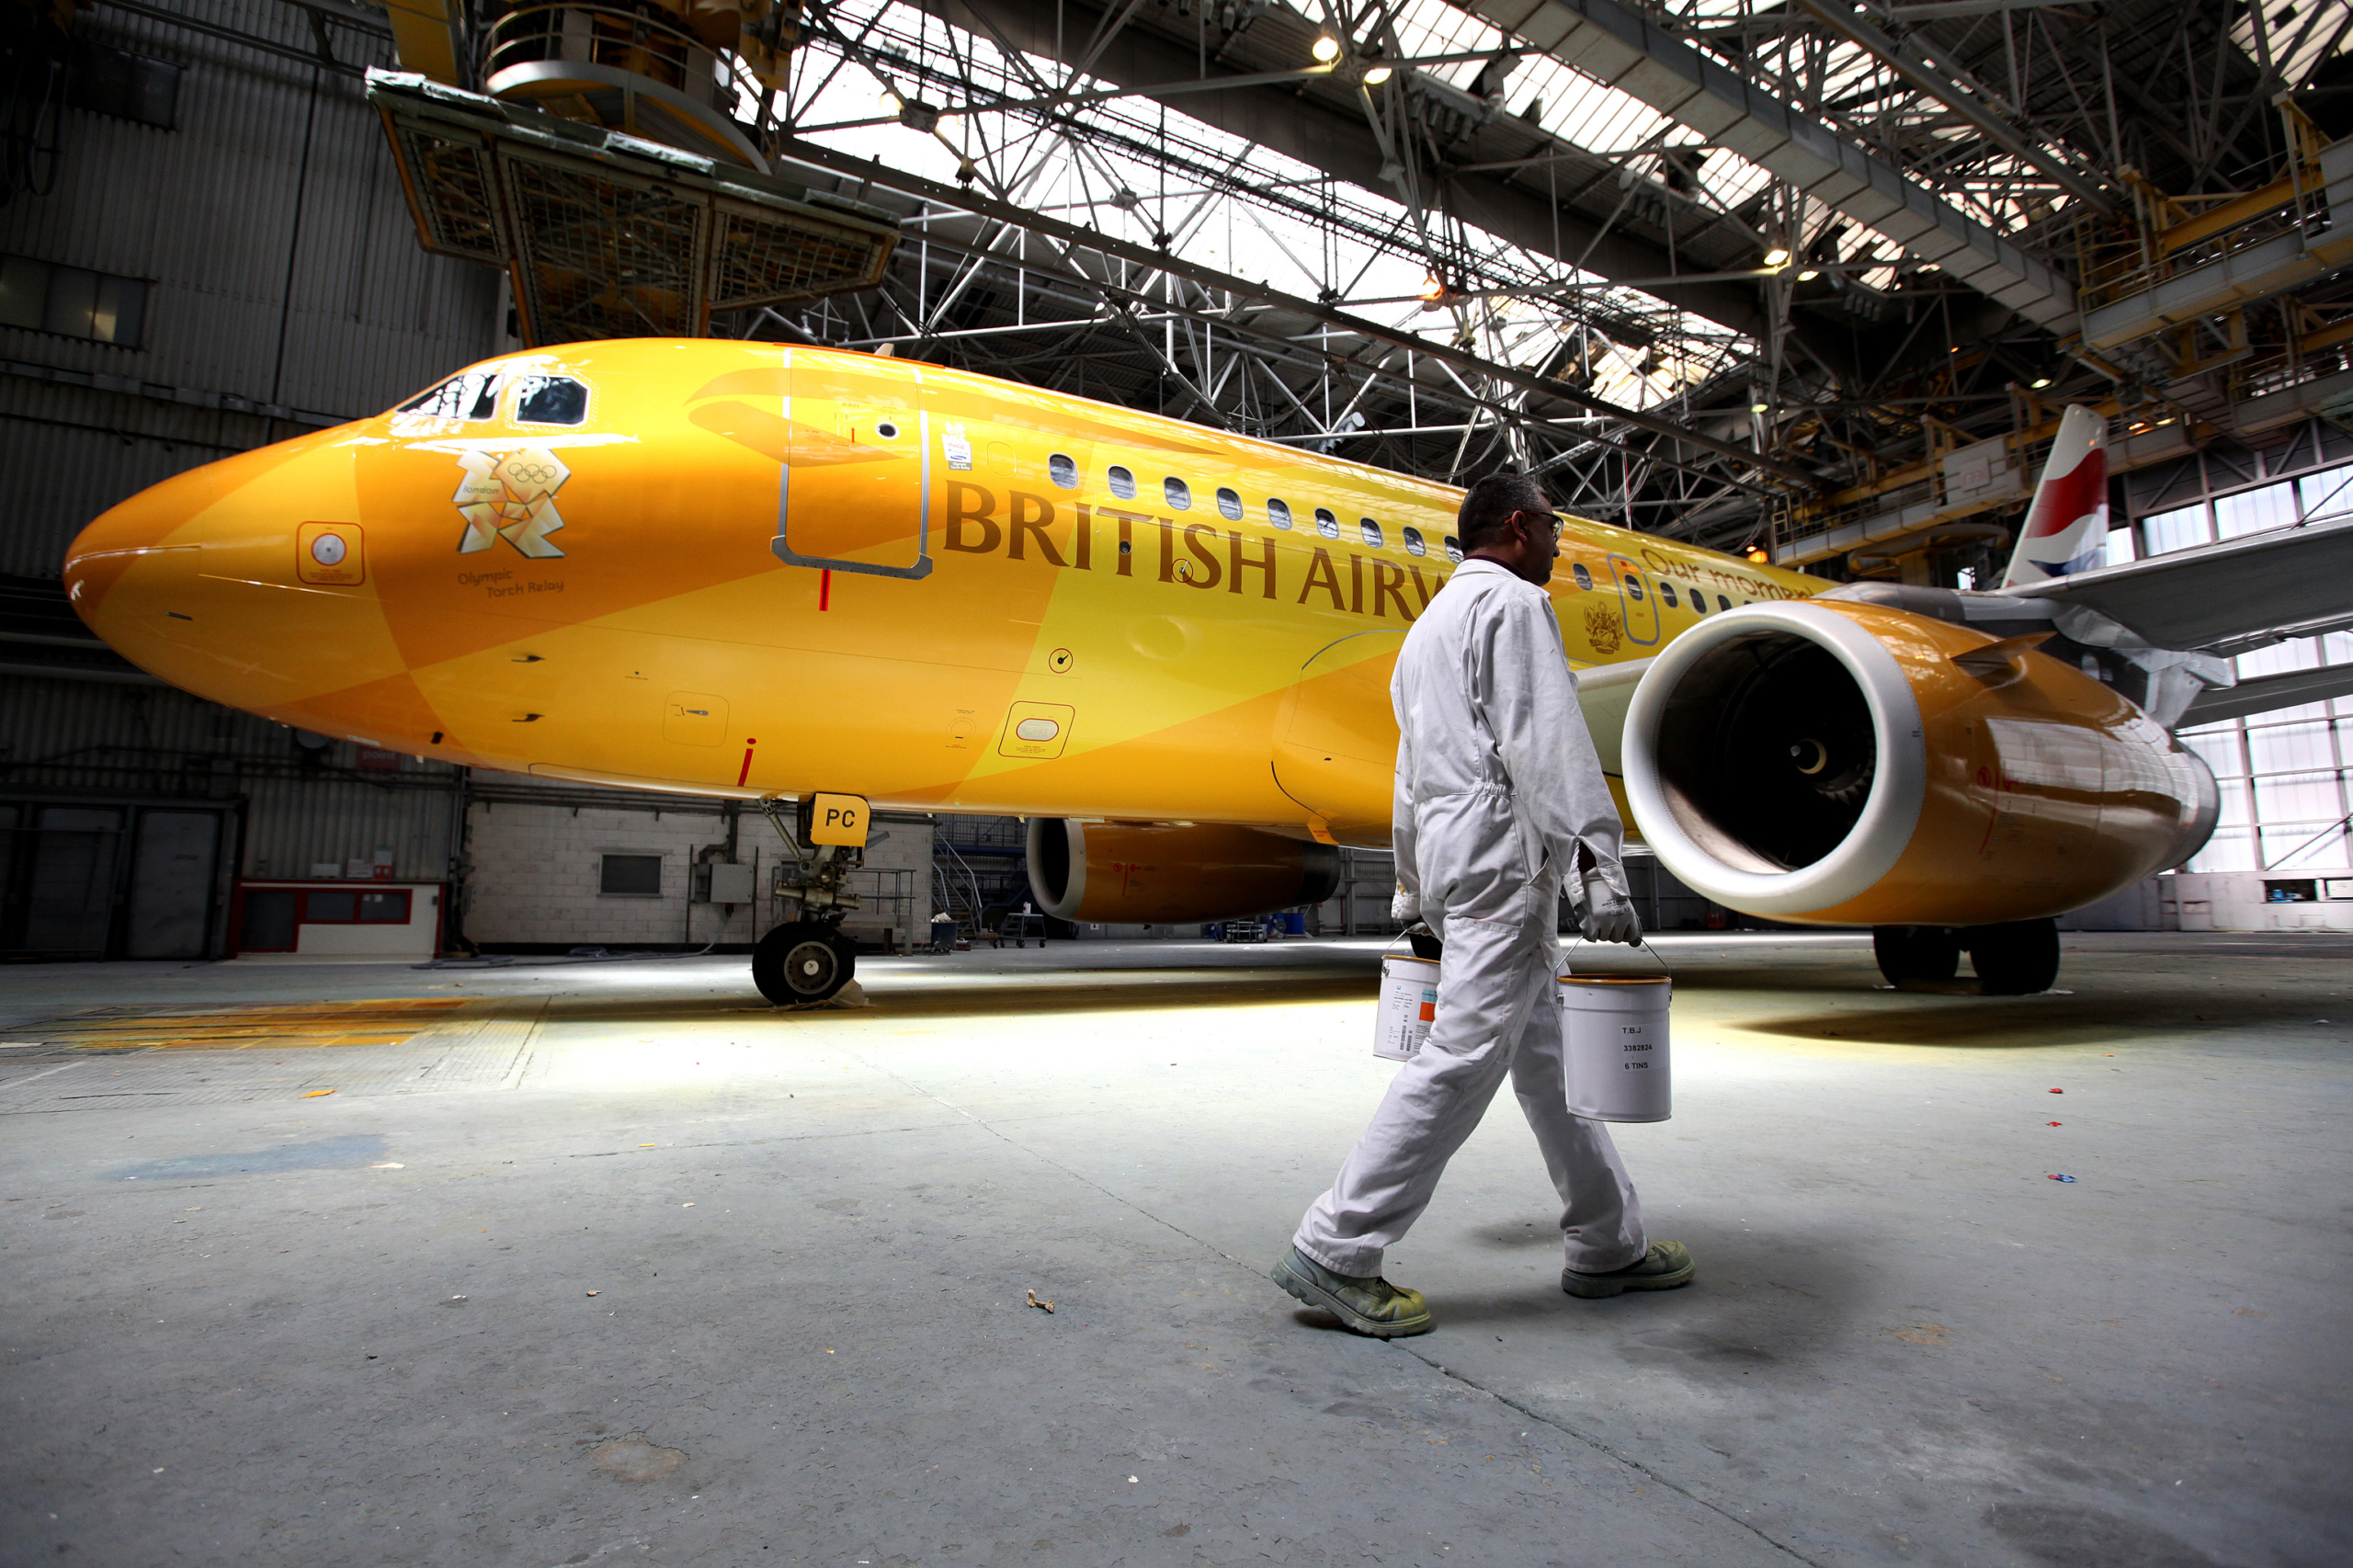 British Airways, Airbus A319, Retirement